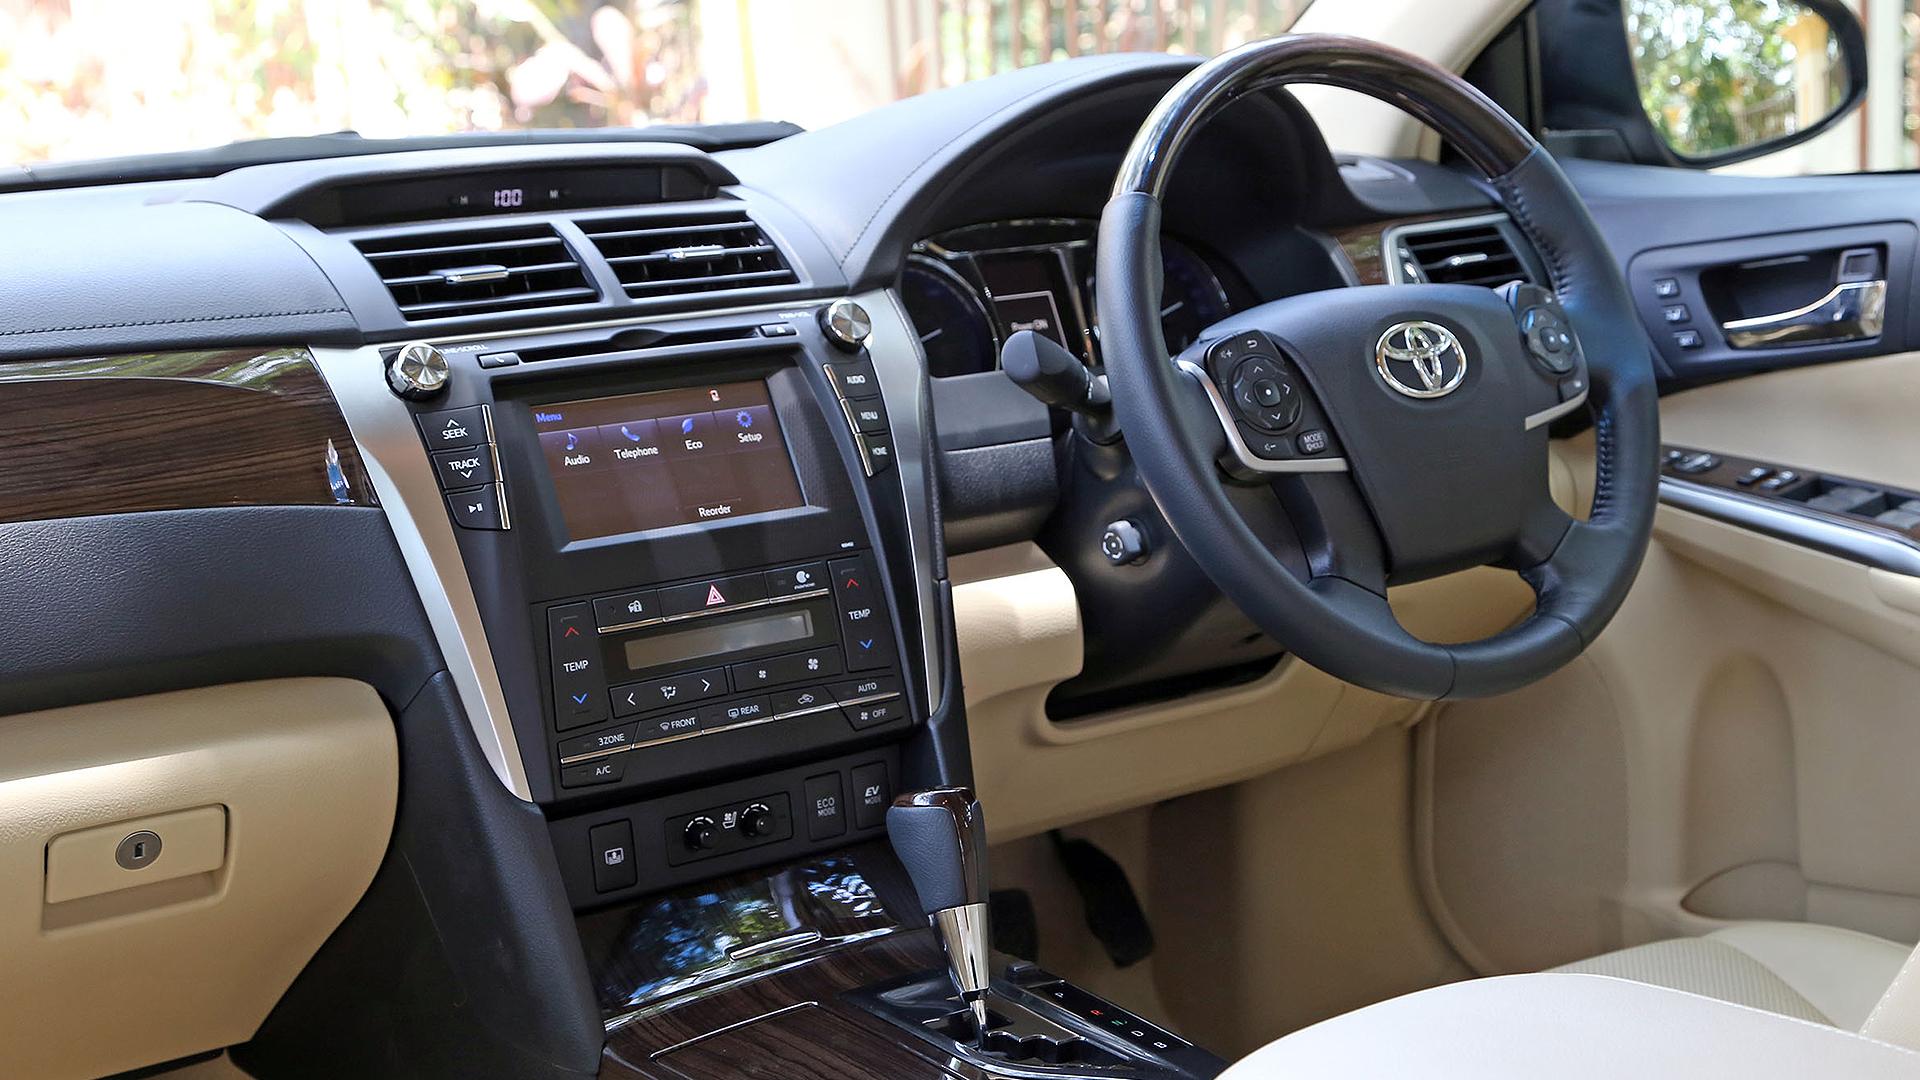 Toyota Camry 2015 Hybrid Compare